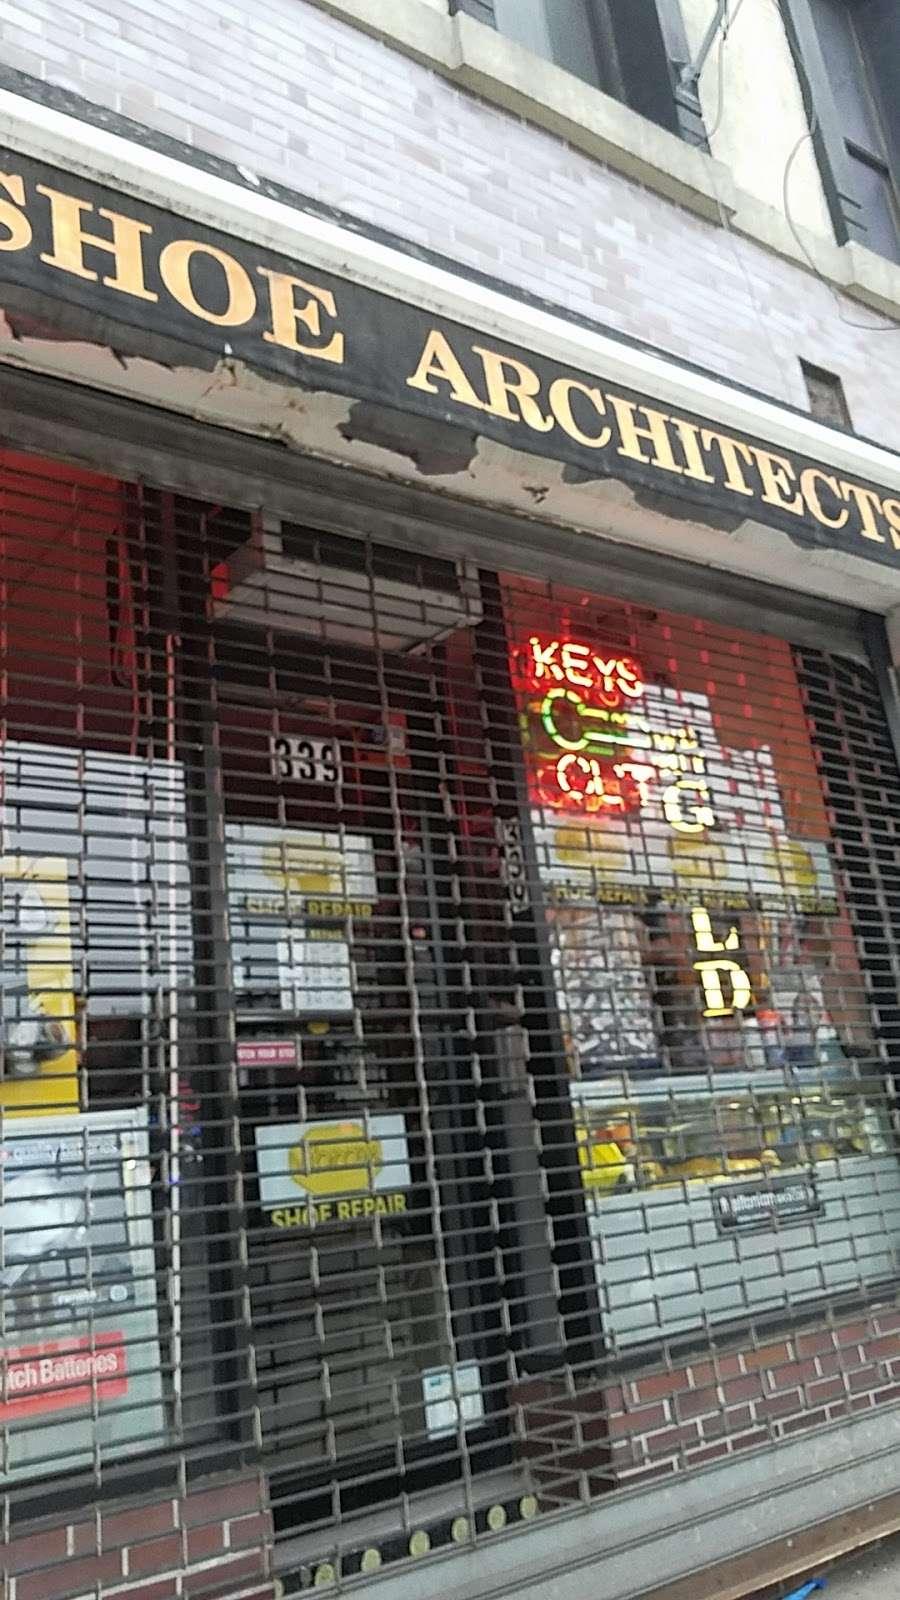 CrazyFixer - store  | Photo 1 of 6 | Address: 339 Flatbush Ave, Brooklyn, NY 11217, USA | Phone: (917) 309-3553